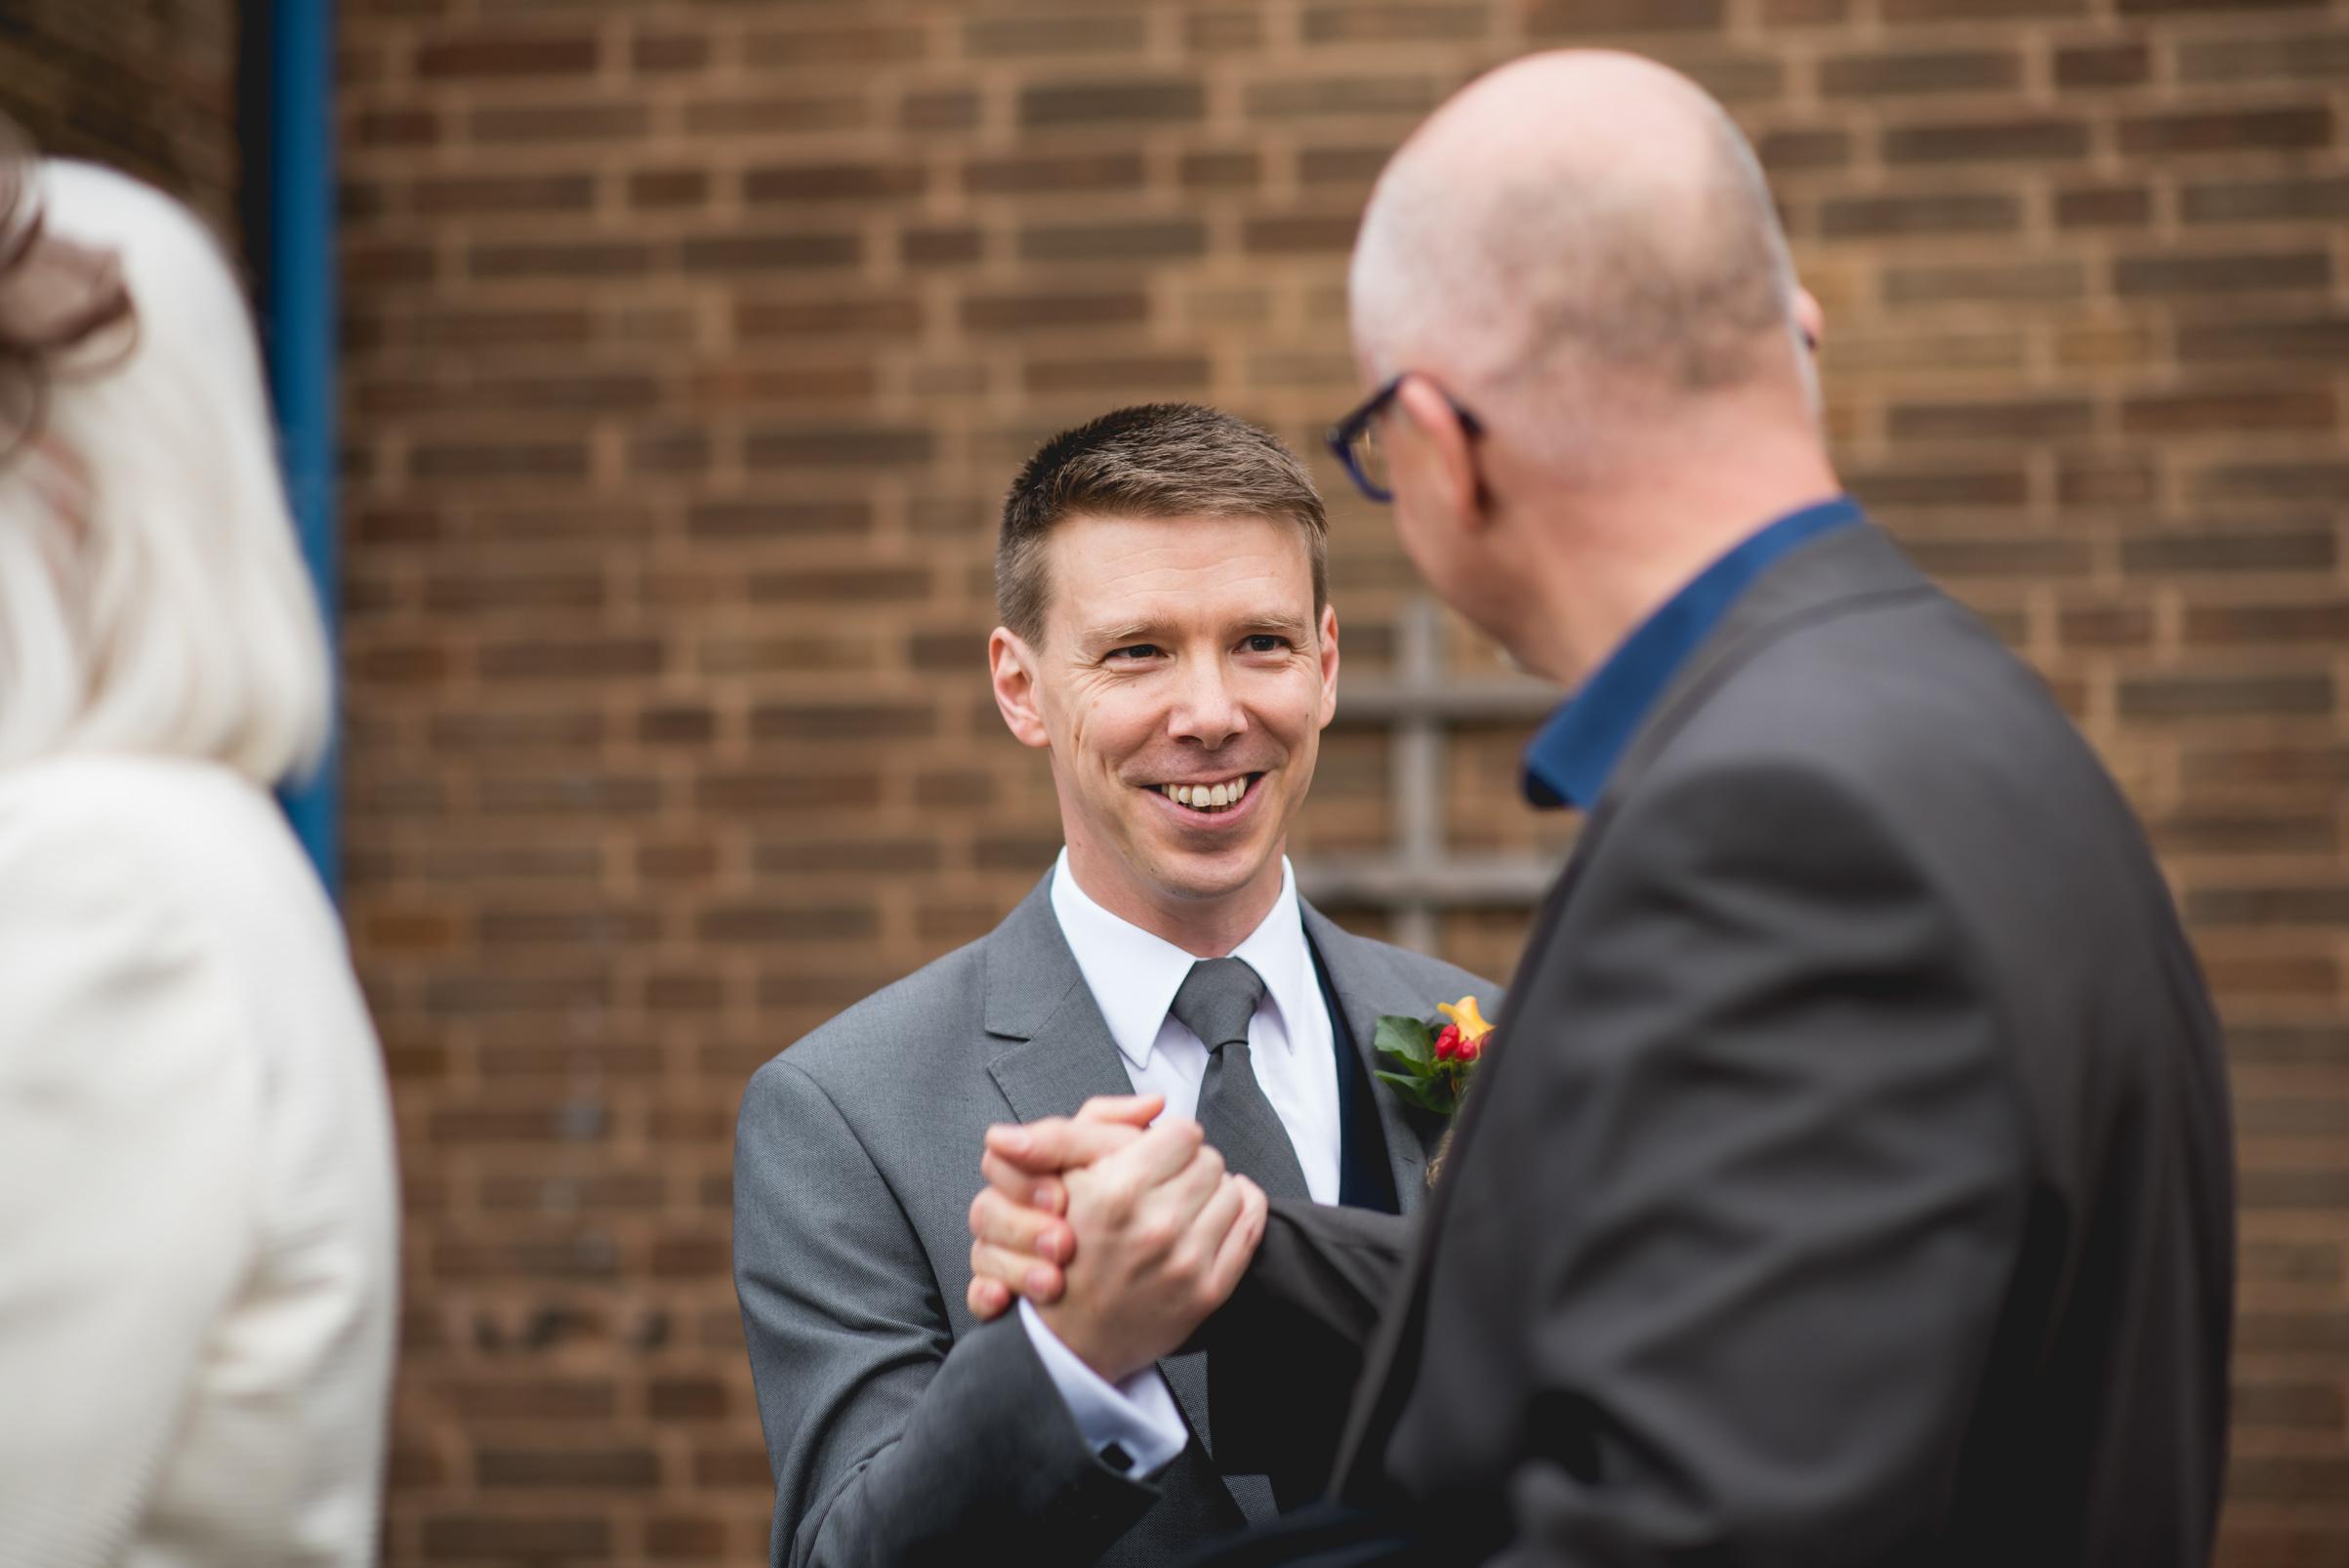 The+Fairlawns+wedding+Aldridge+StLukes+Church-108.jpg